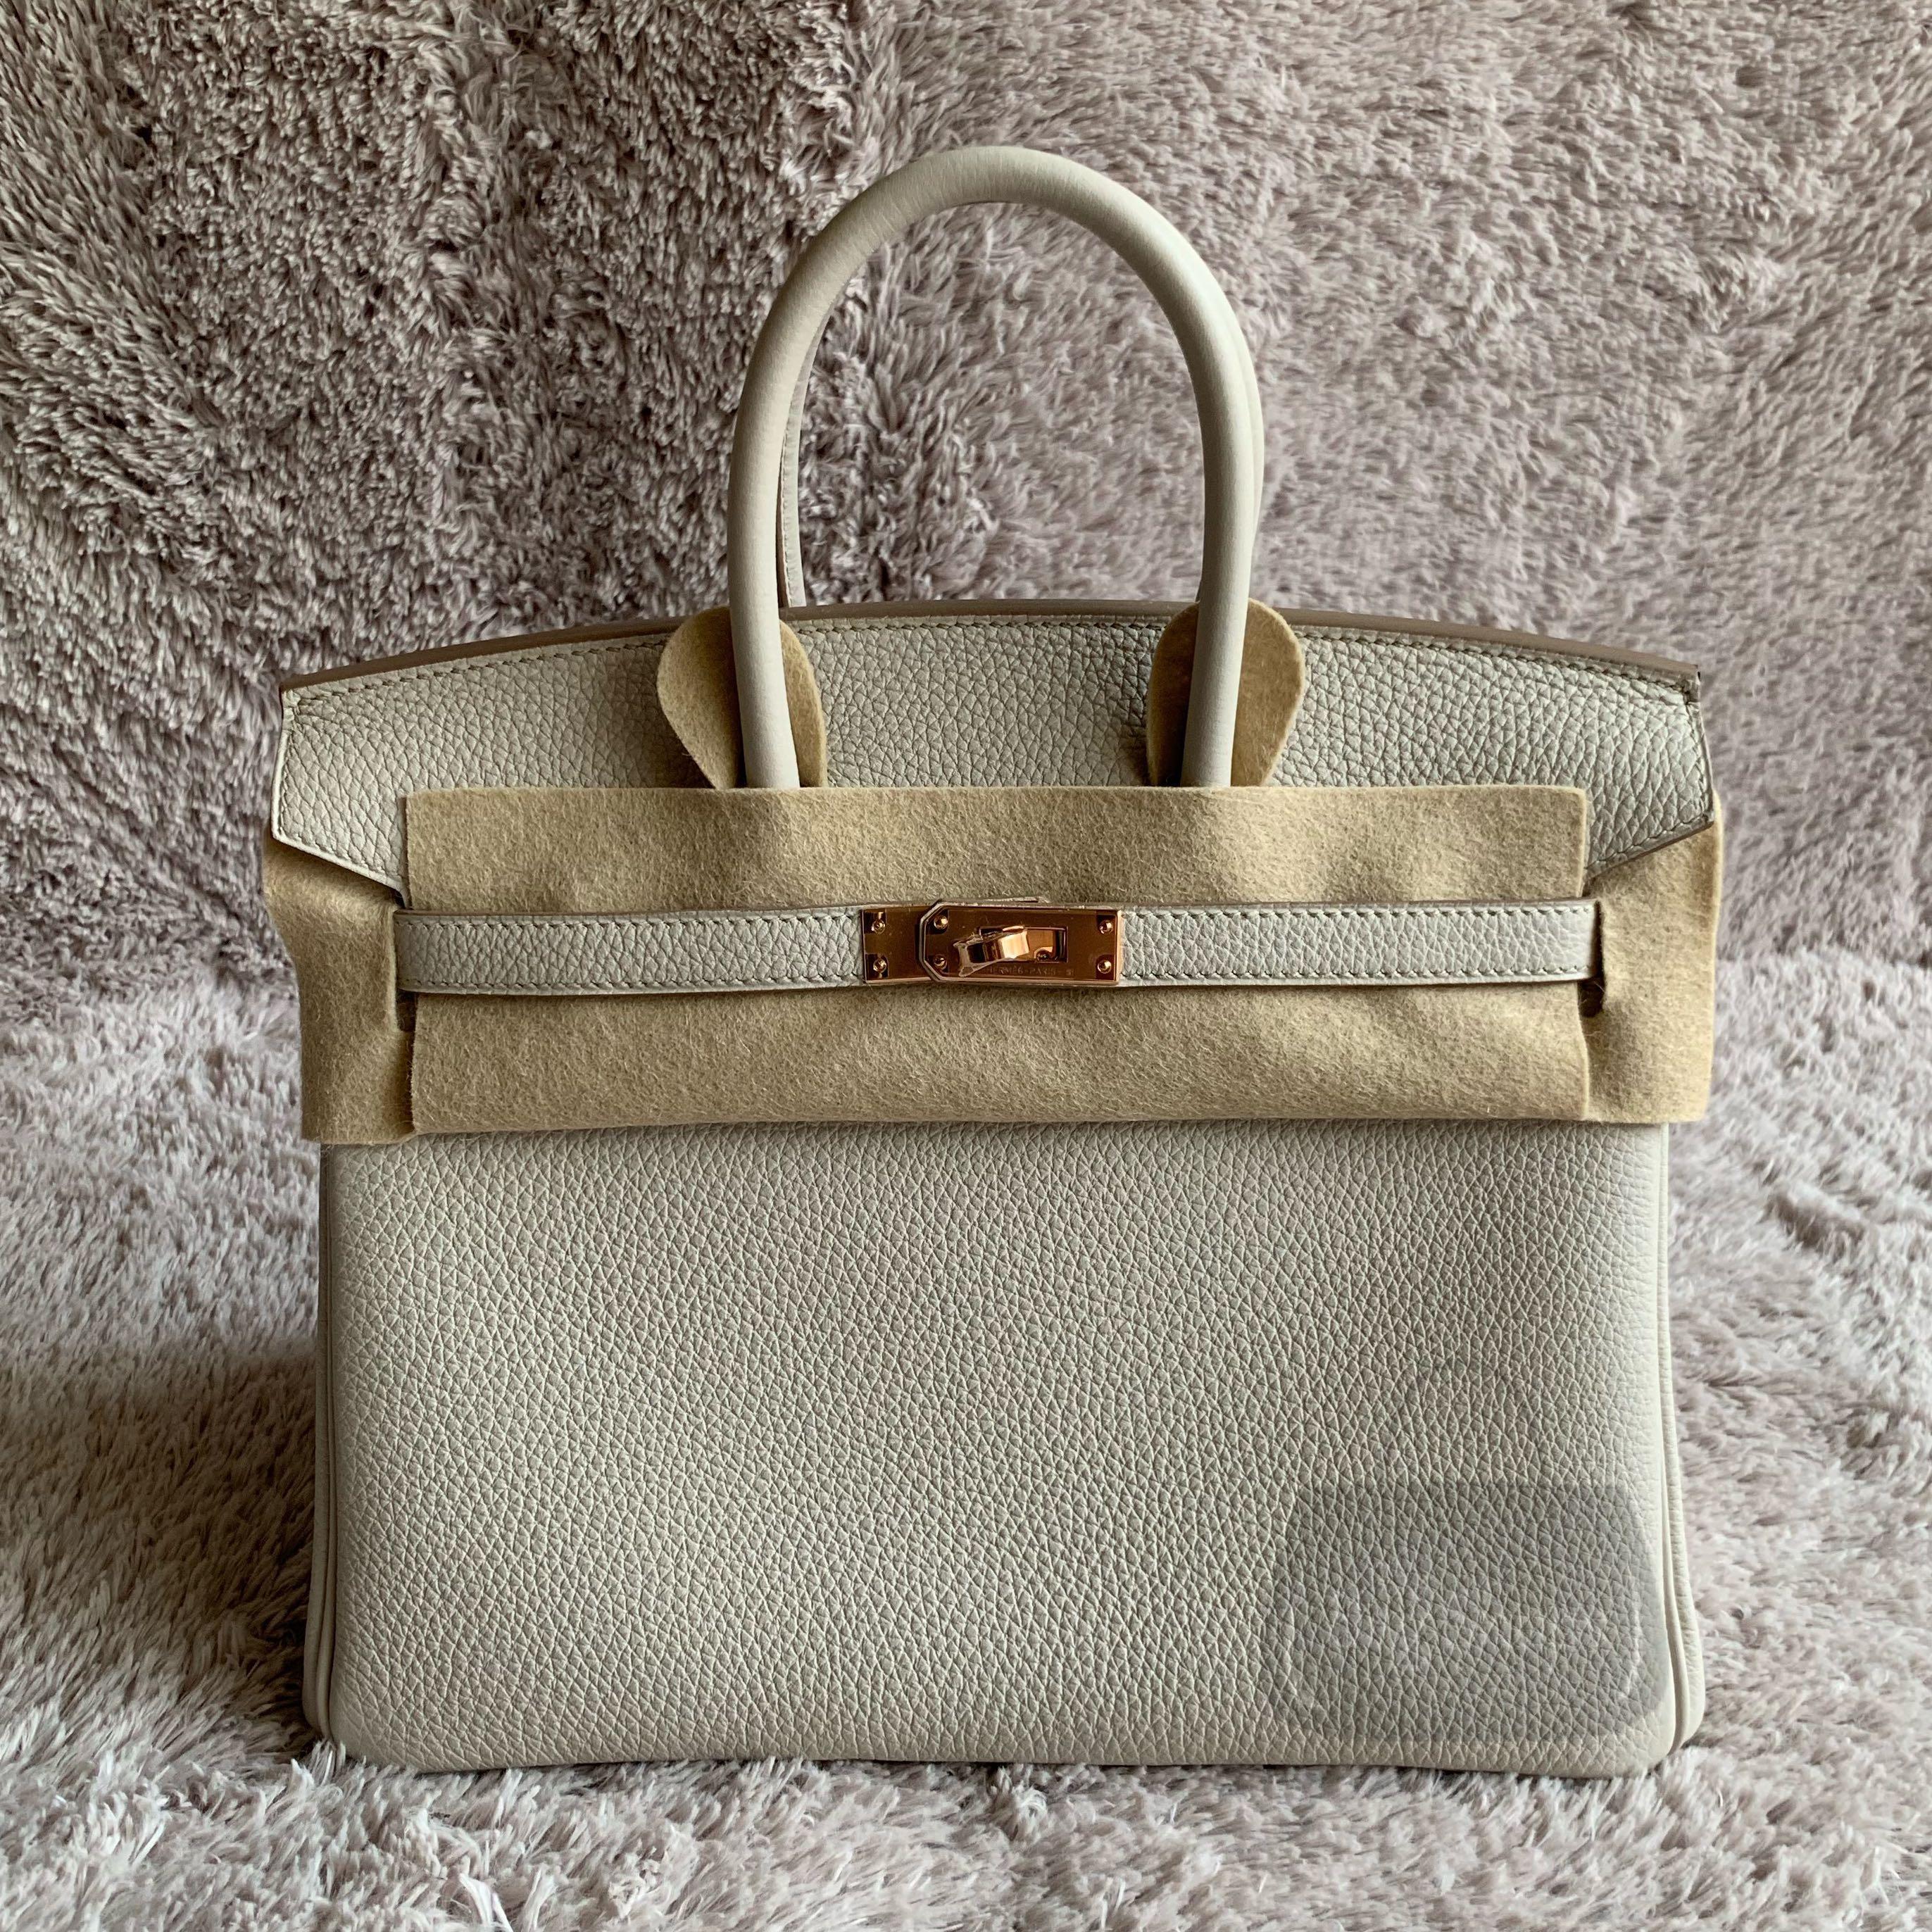 fd0b99b484 💯% Authentic Brand New Hermes Birkin 25 Beton Togo RGHW